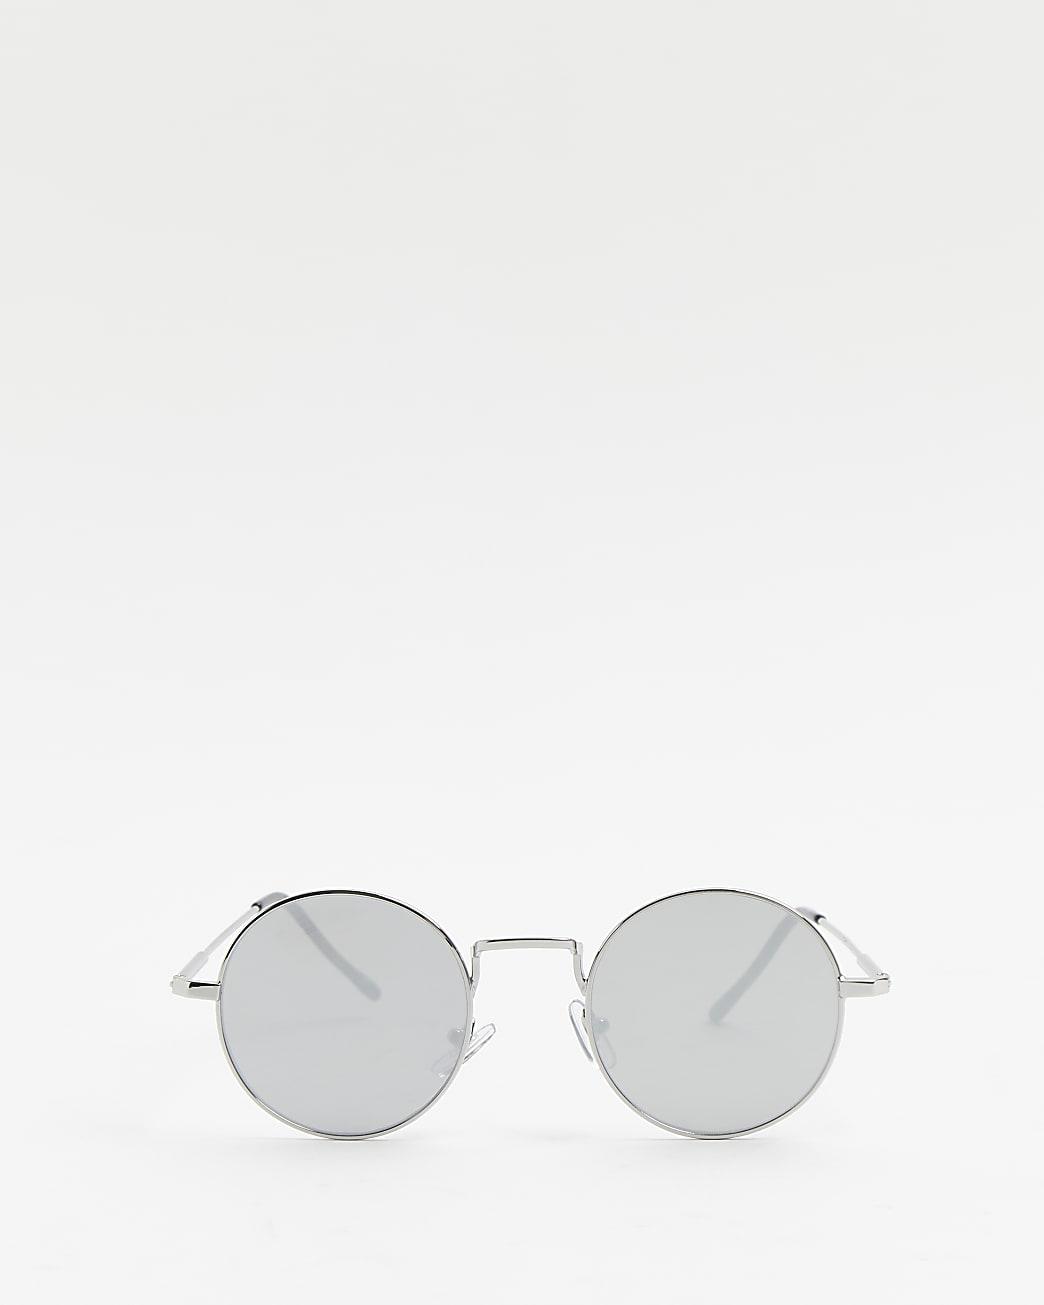 Silver mirrored round aviator sunglasses